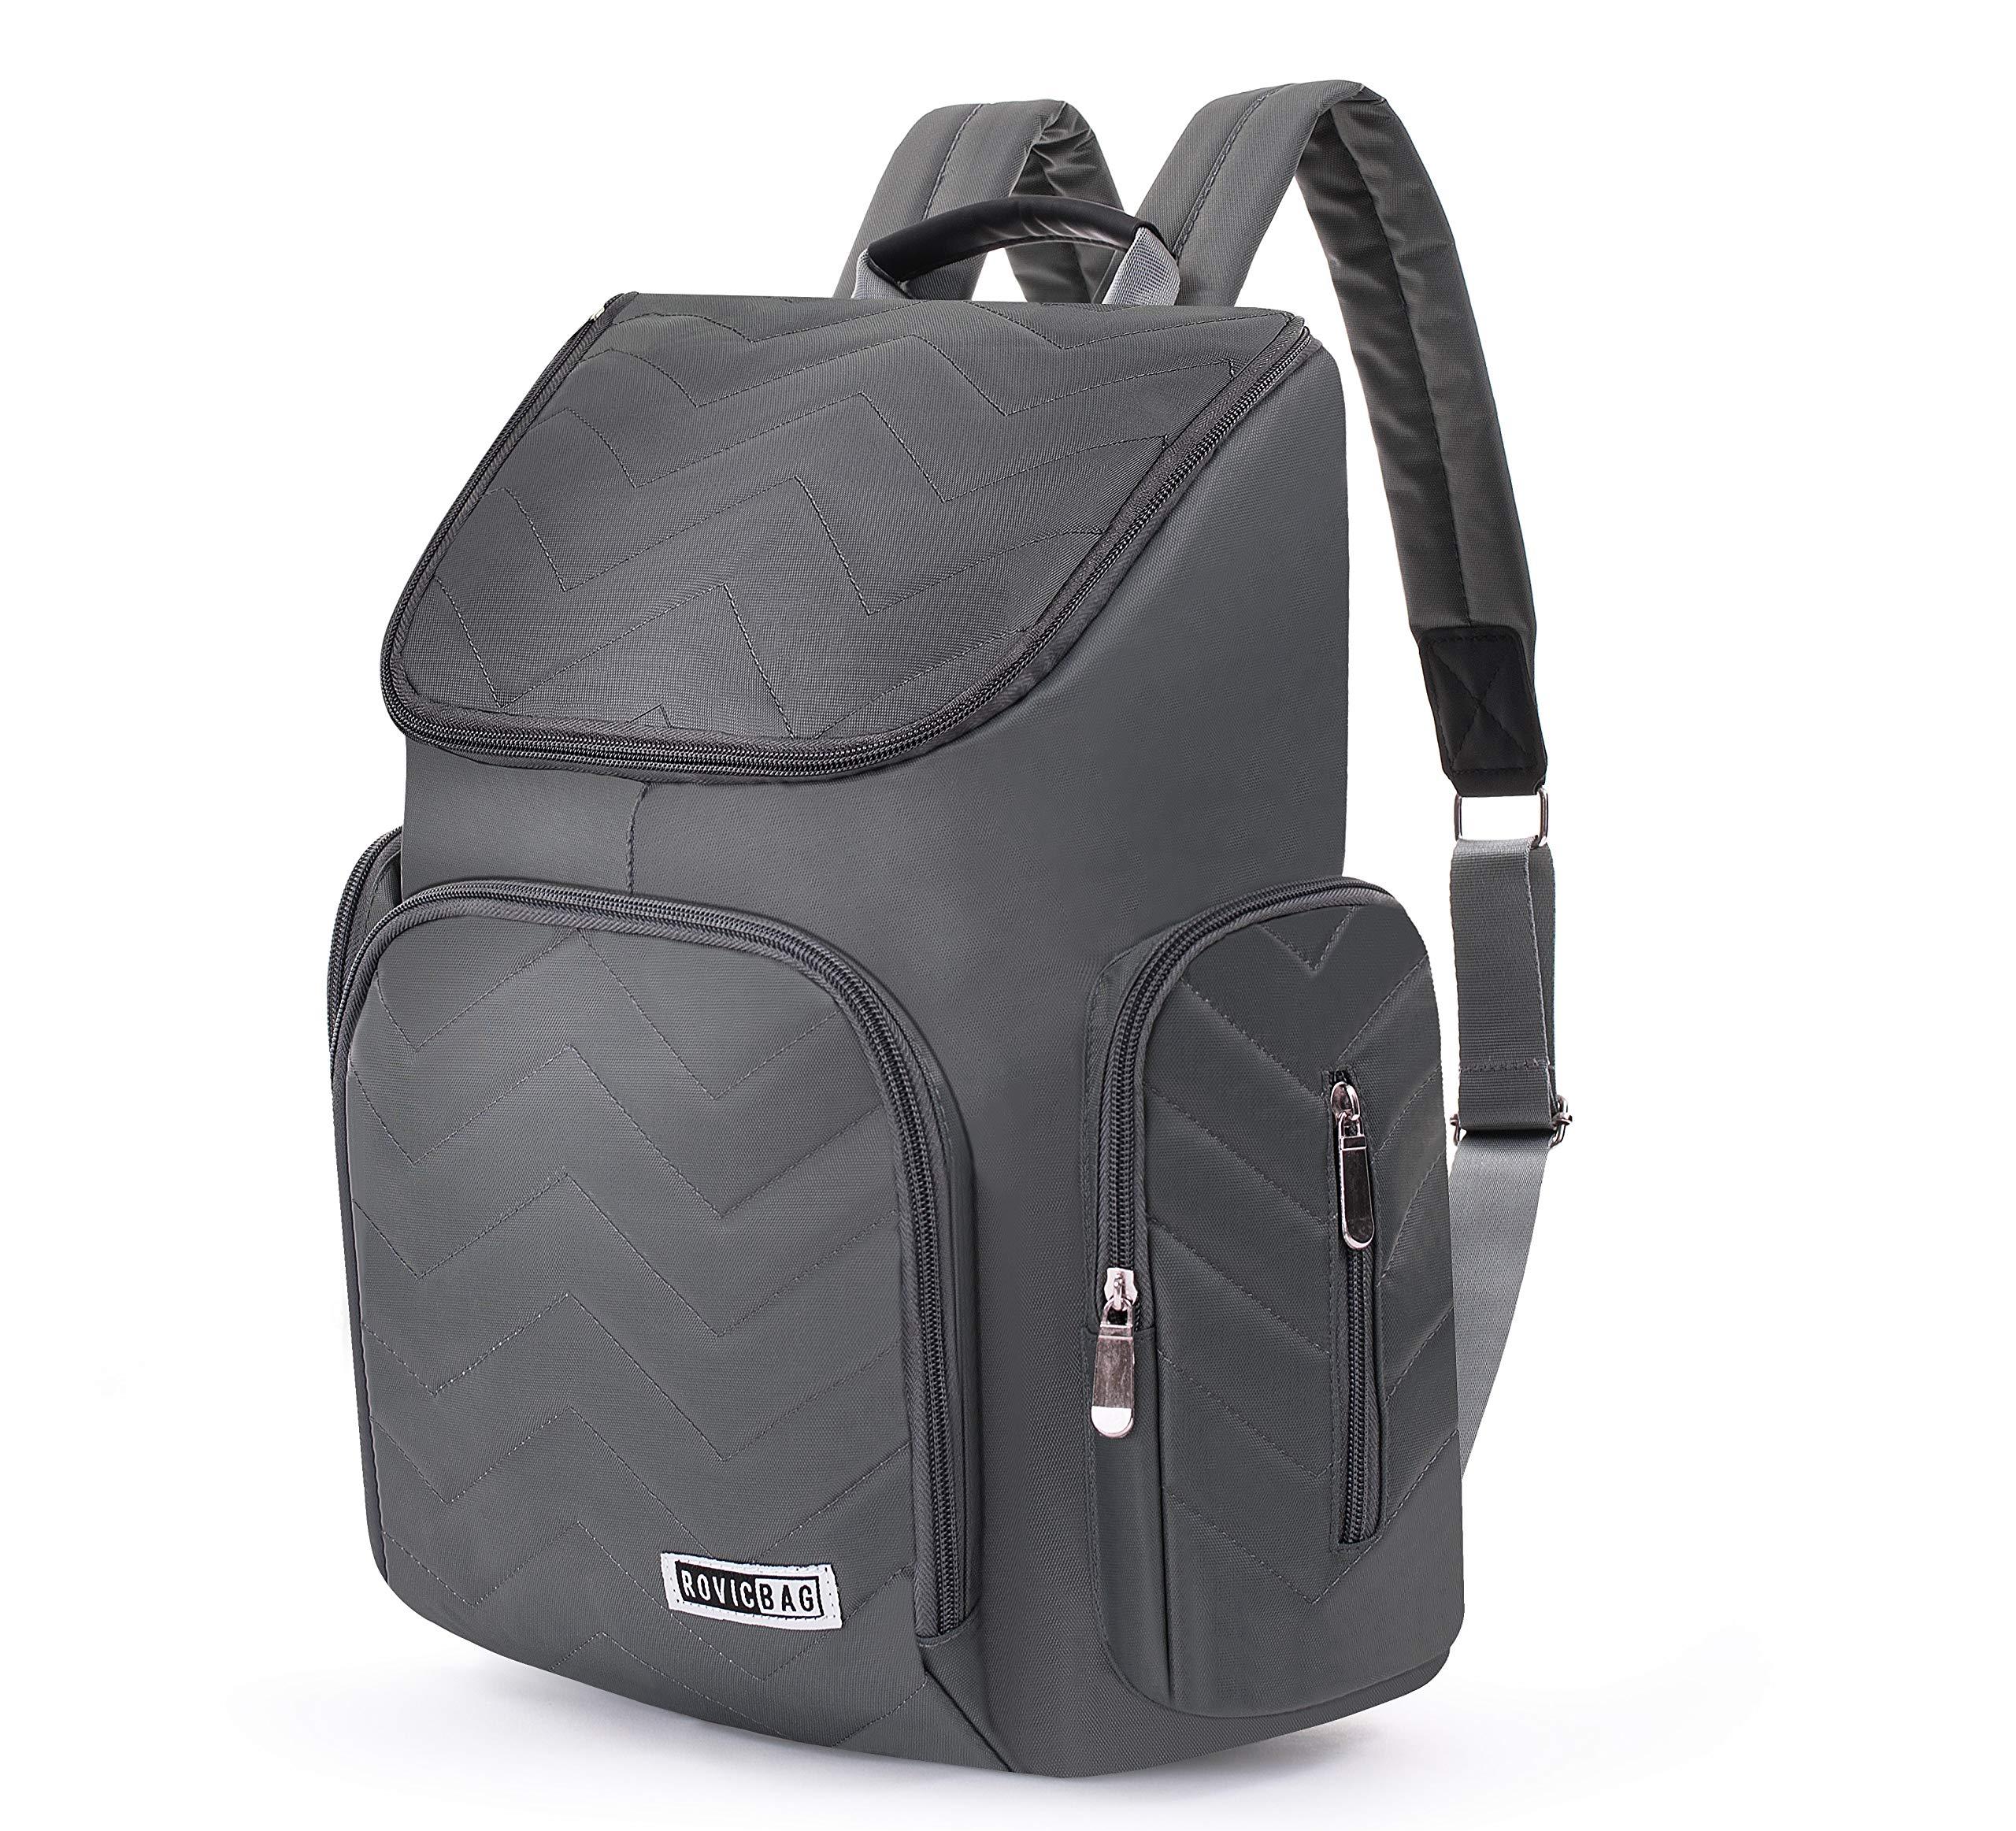 Diaper Bag Backpack for Babys, Moms & Dads, Girls & Boys - Straps for Strollers, Luggage Belt - Waterproof, Wet Bag, with Pockets for Wipes, Bottles, Changing Mat Included - Unisex Grey Design